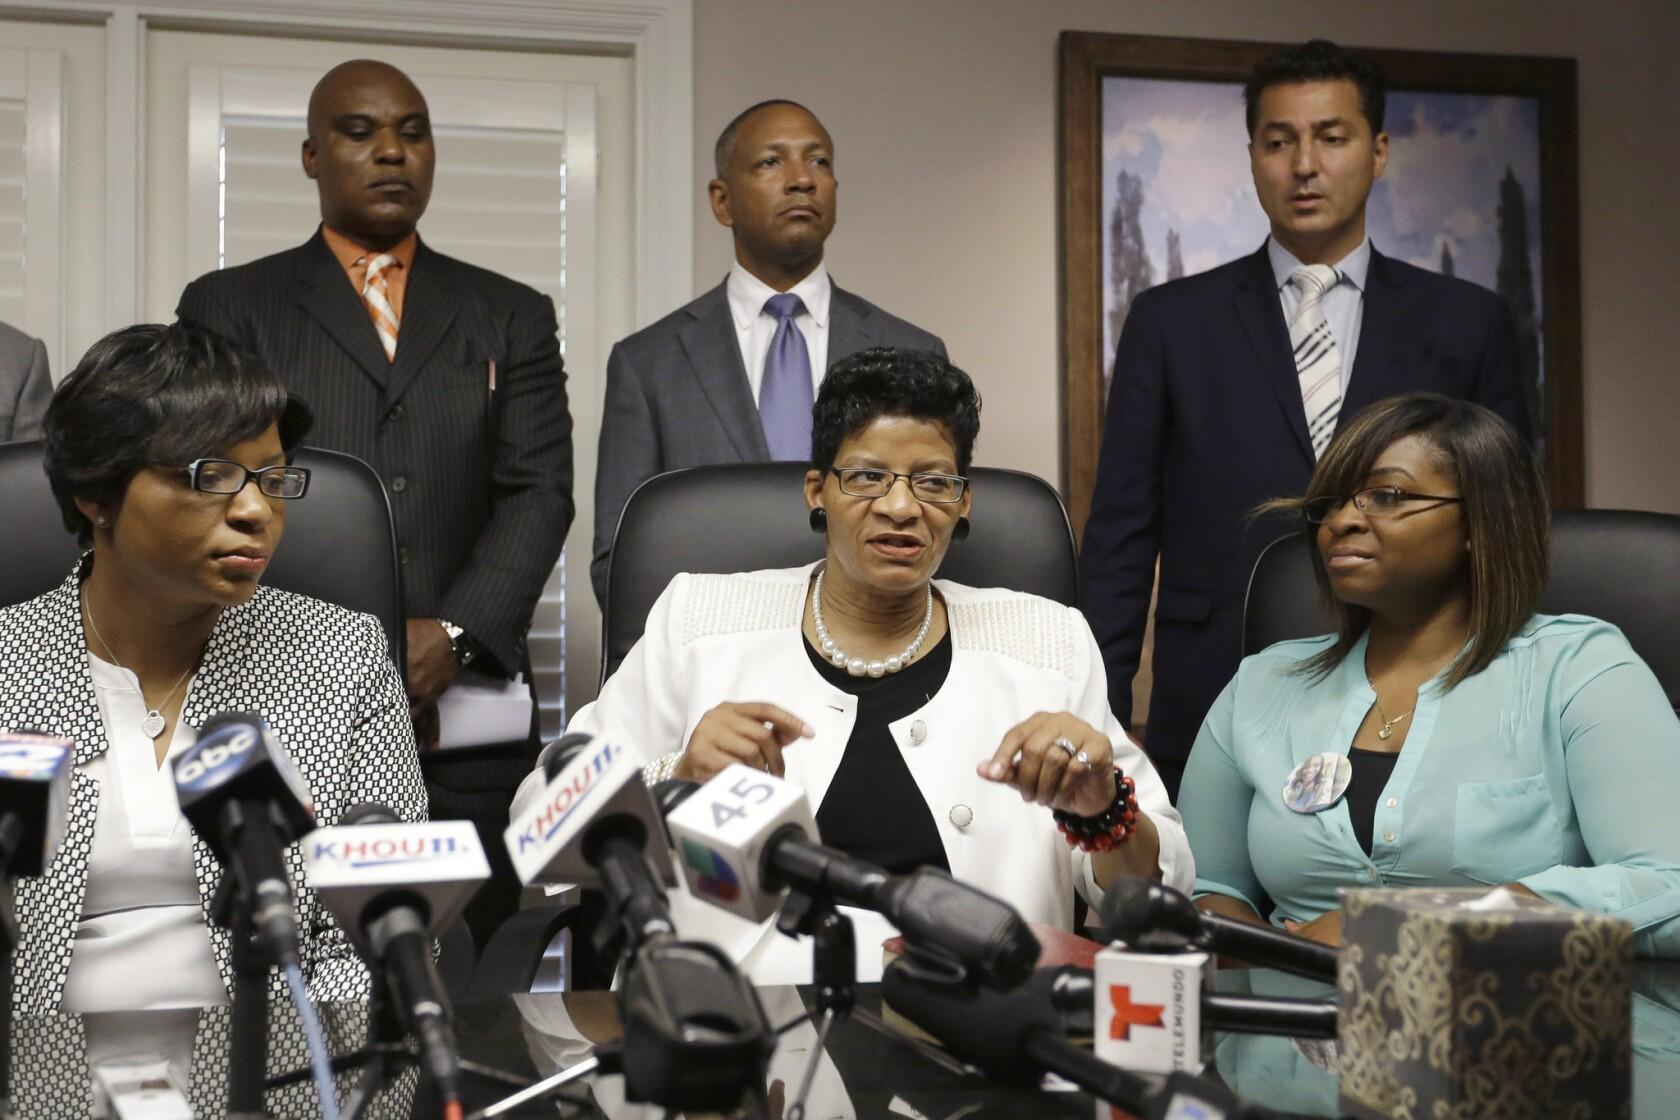 Texas probe: Trooper rude to Sandra Bland, did not follow procedures